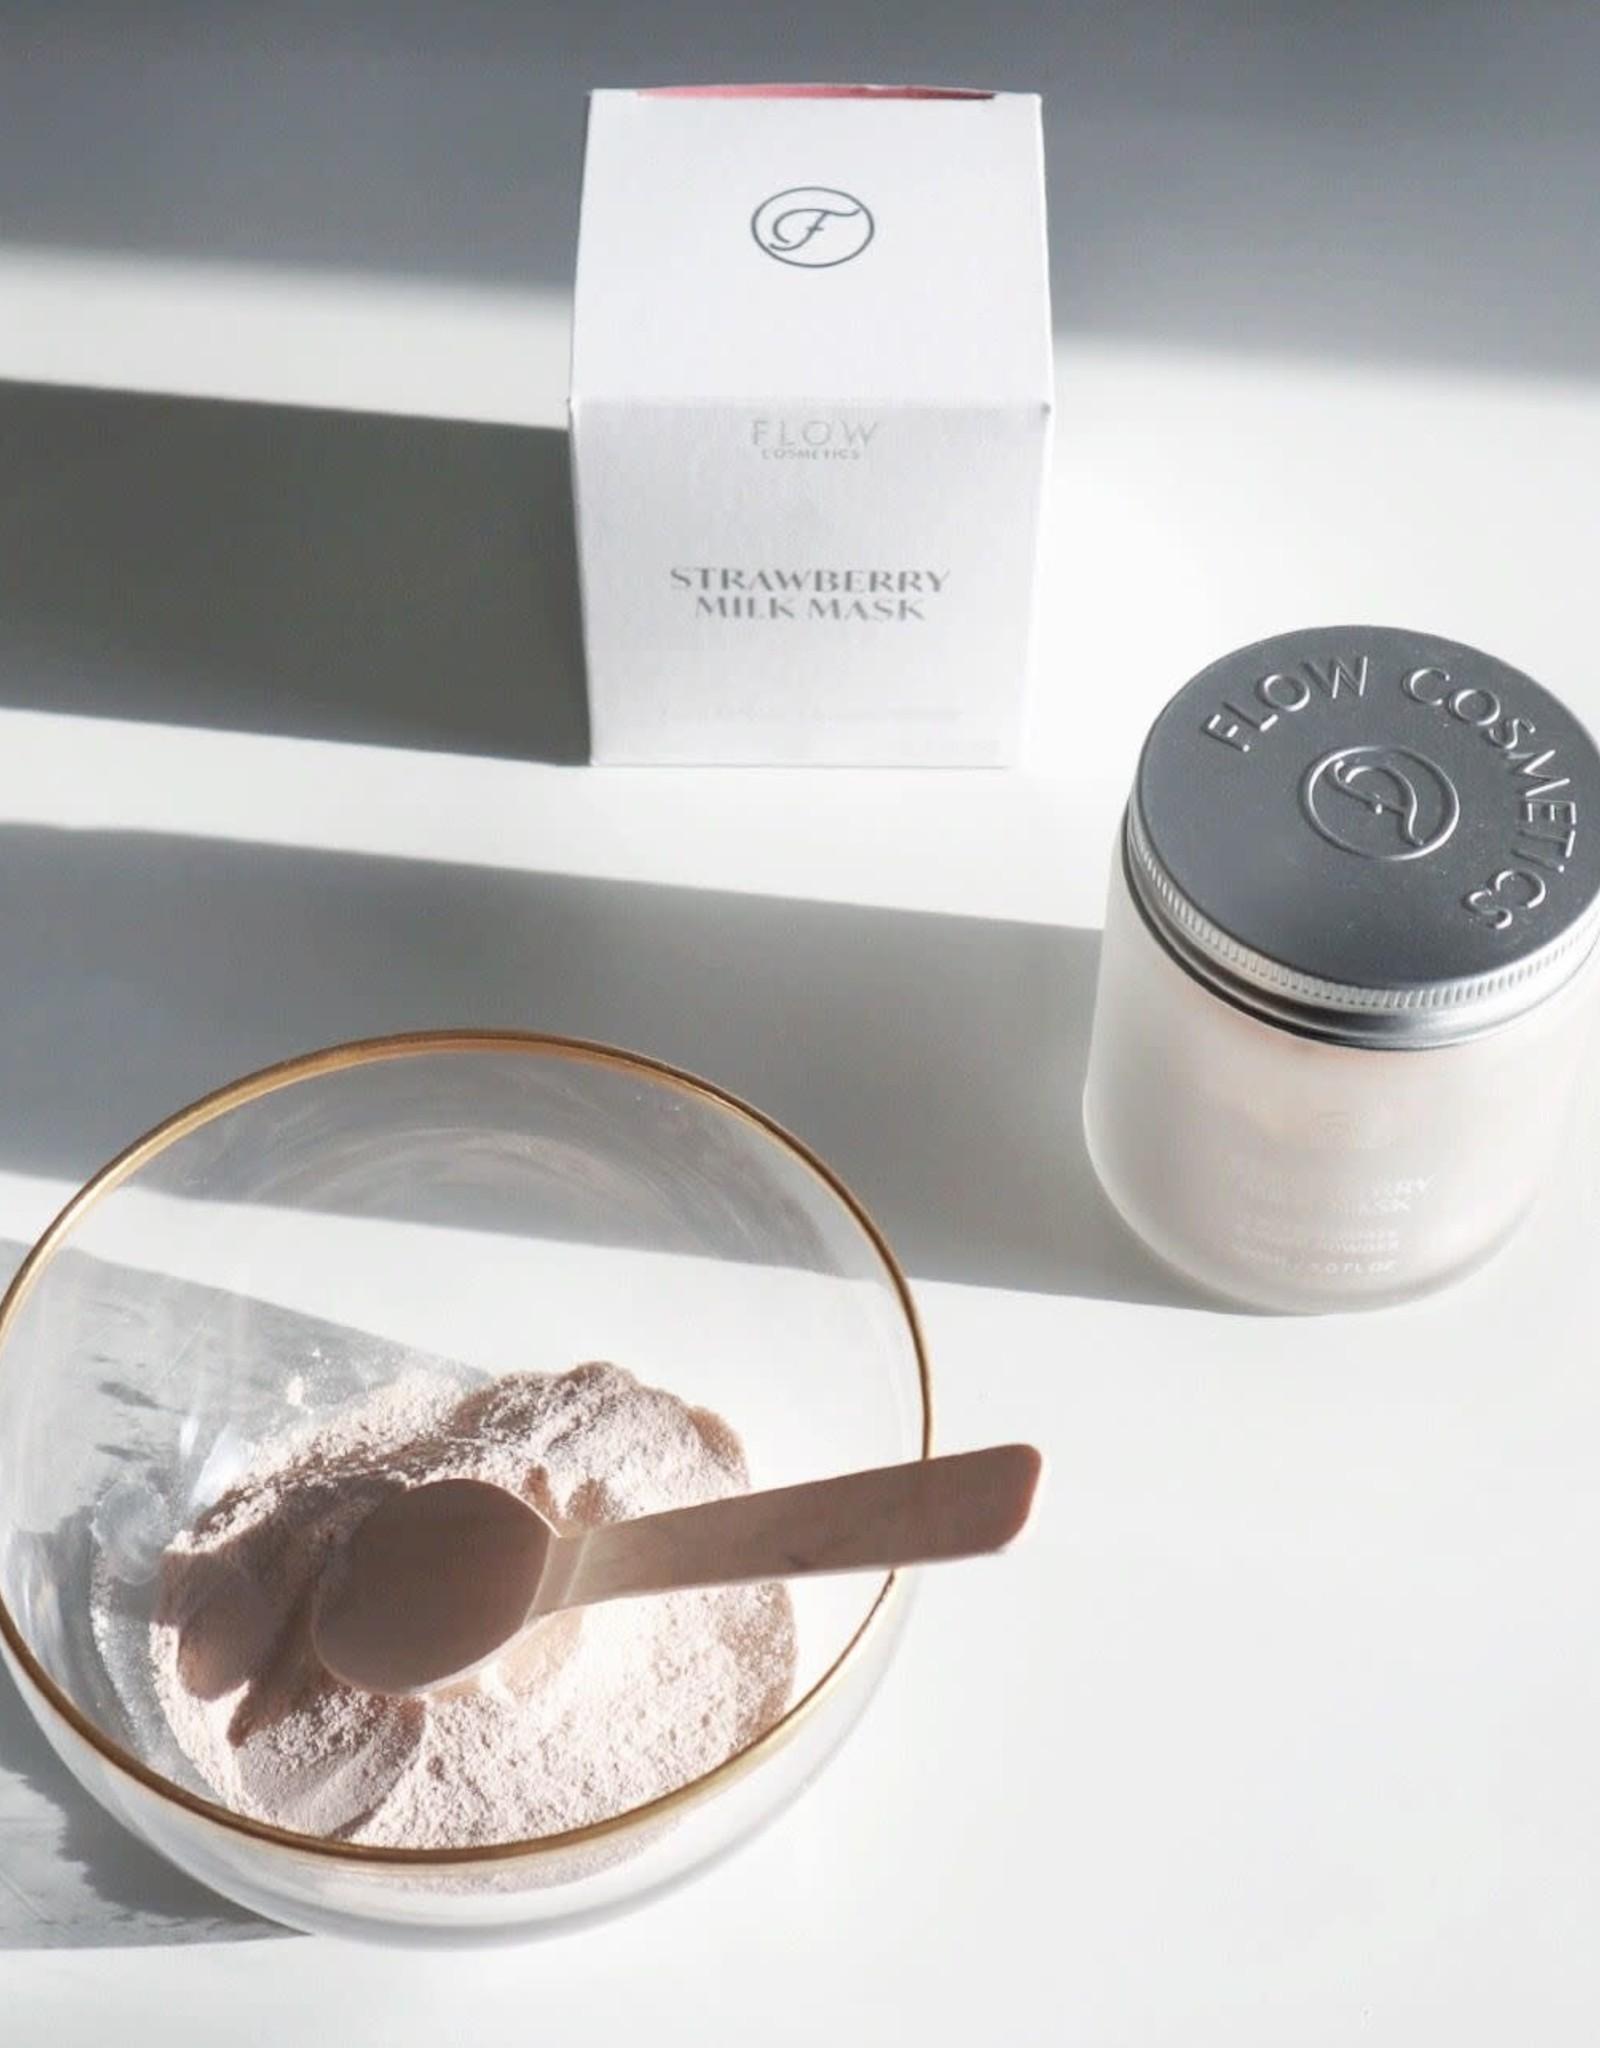 Flow Cosmetics Strawberry Milk Mask - 2 in 1 Exfoiliate & Mask 120 ml